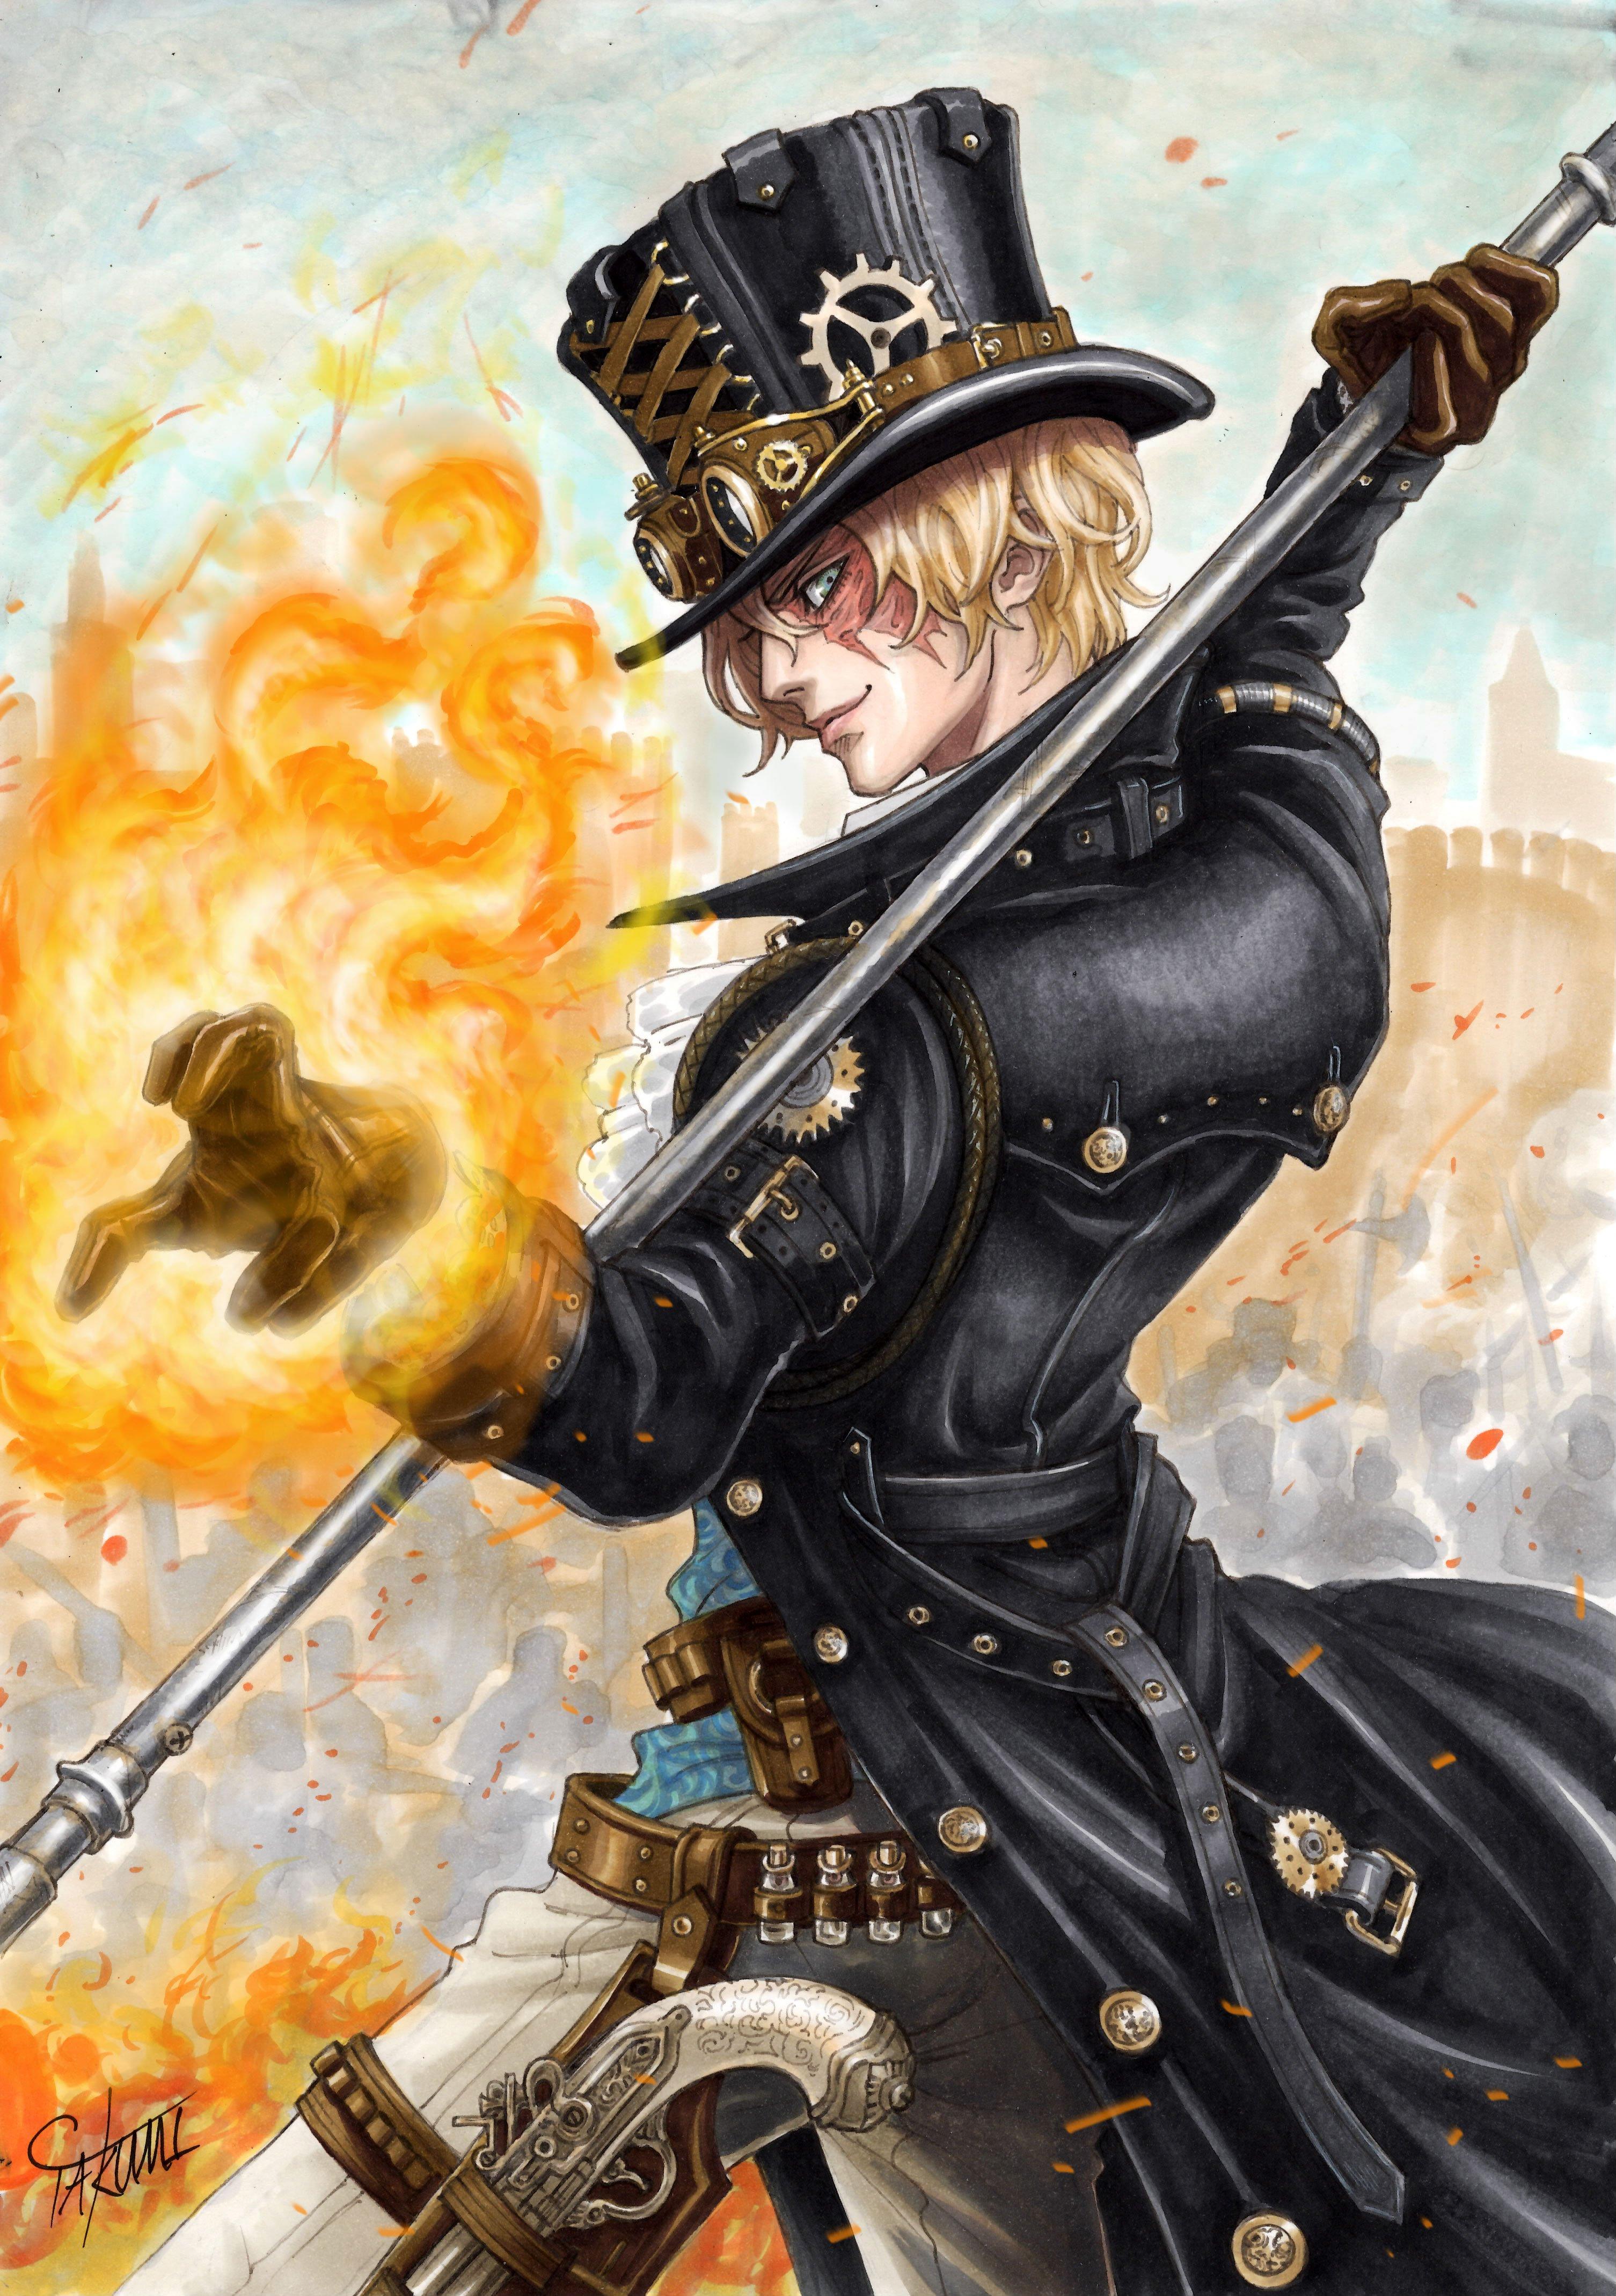 Gun Male Marlboro One Piece Sabo Weapon Wallpaper